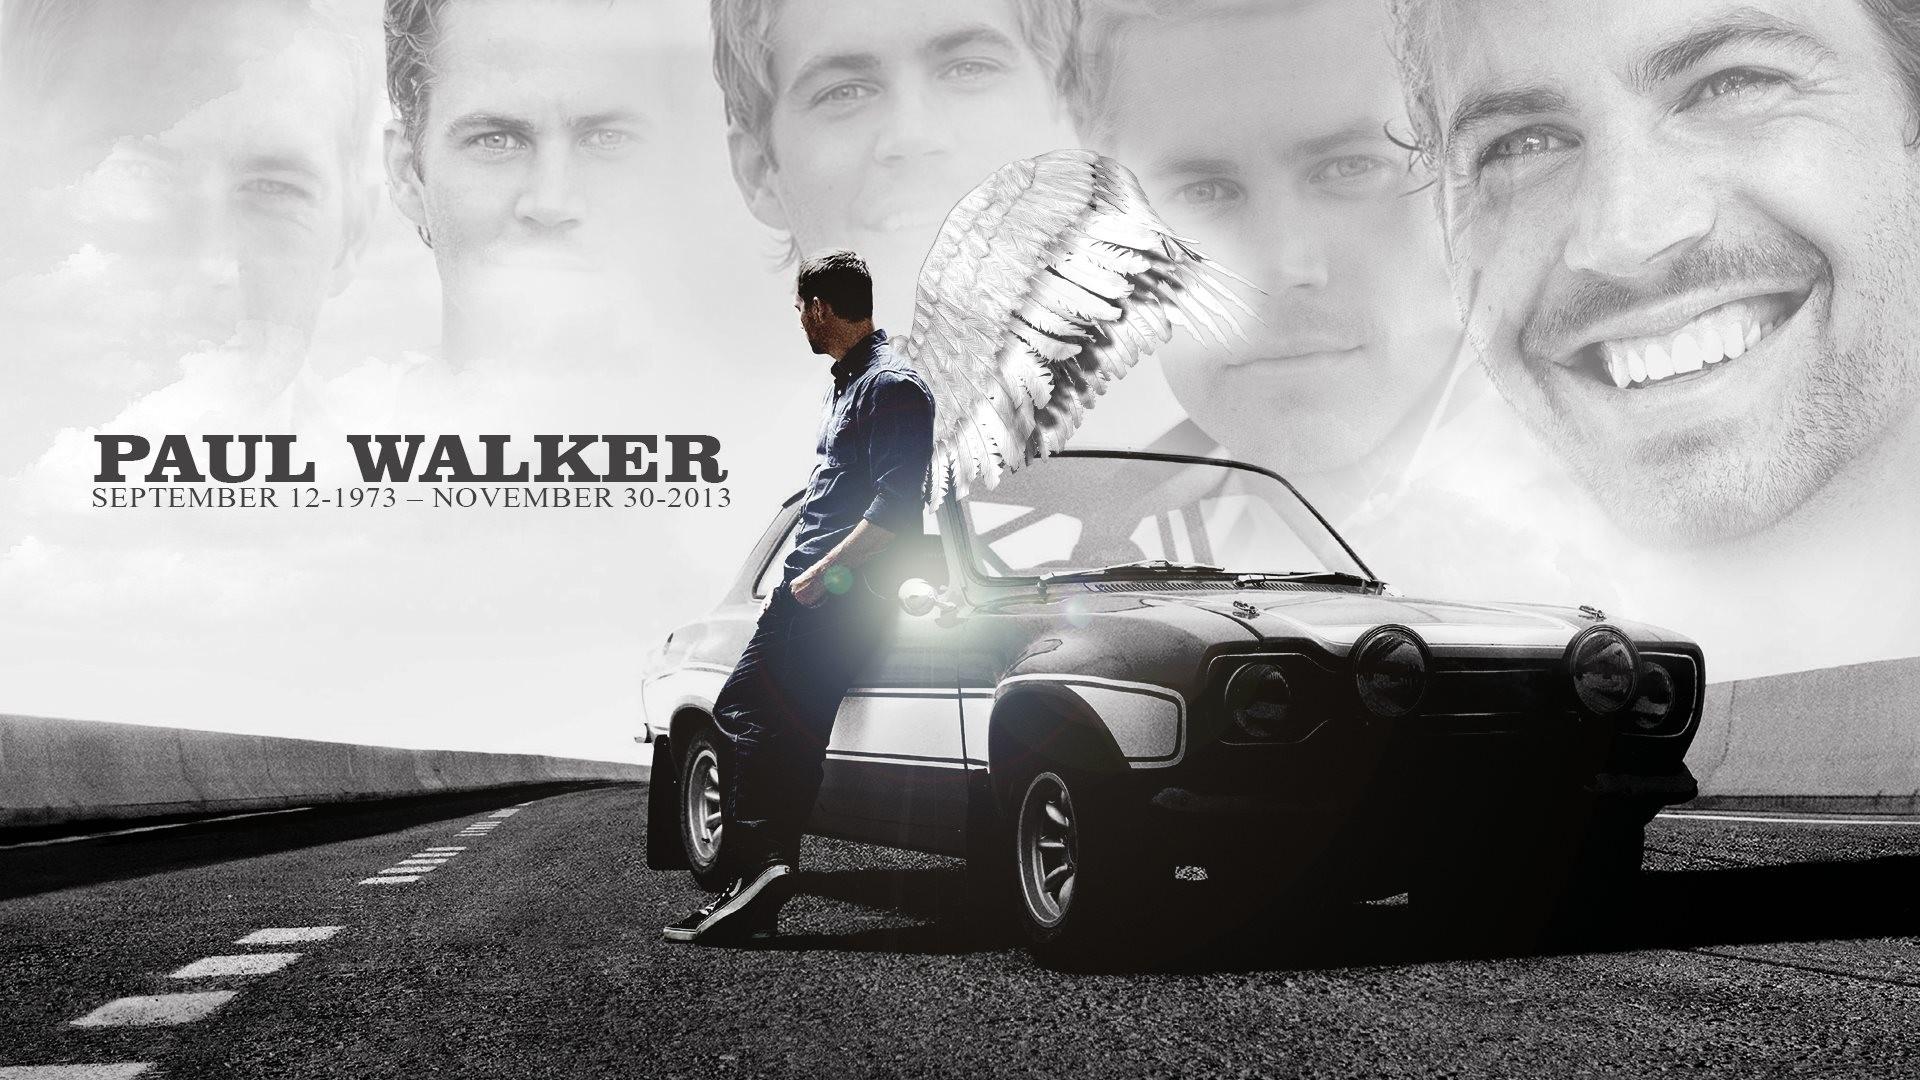 RIP Paul Walker HD Wallpapers. 4K Wallpapers